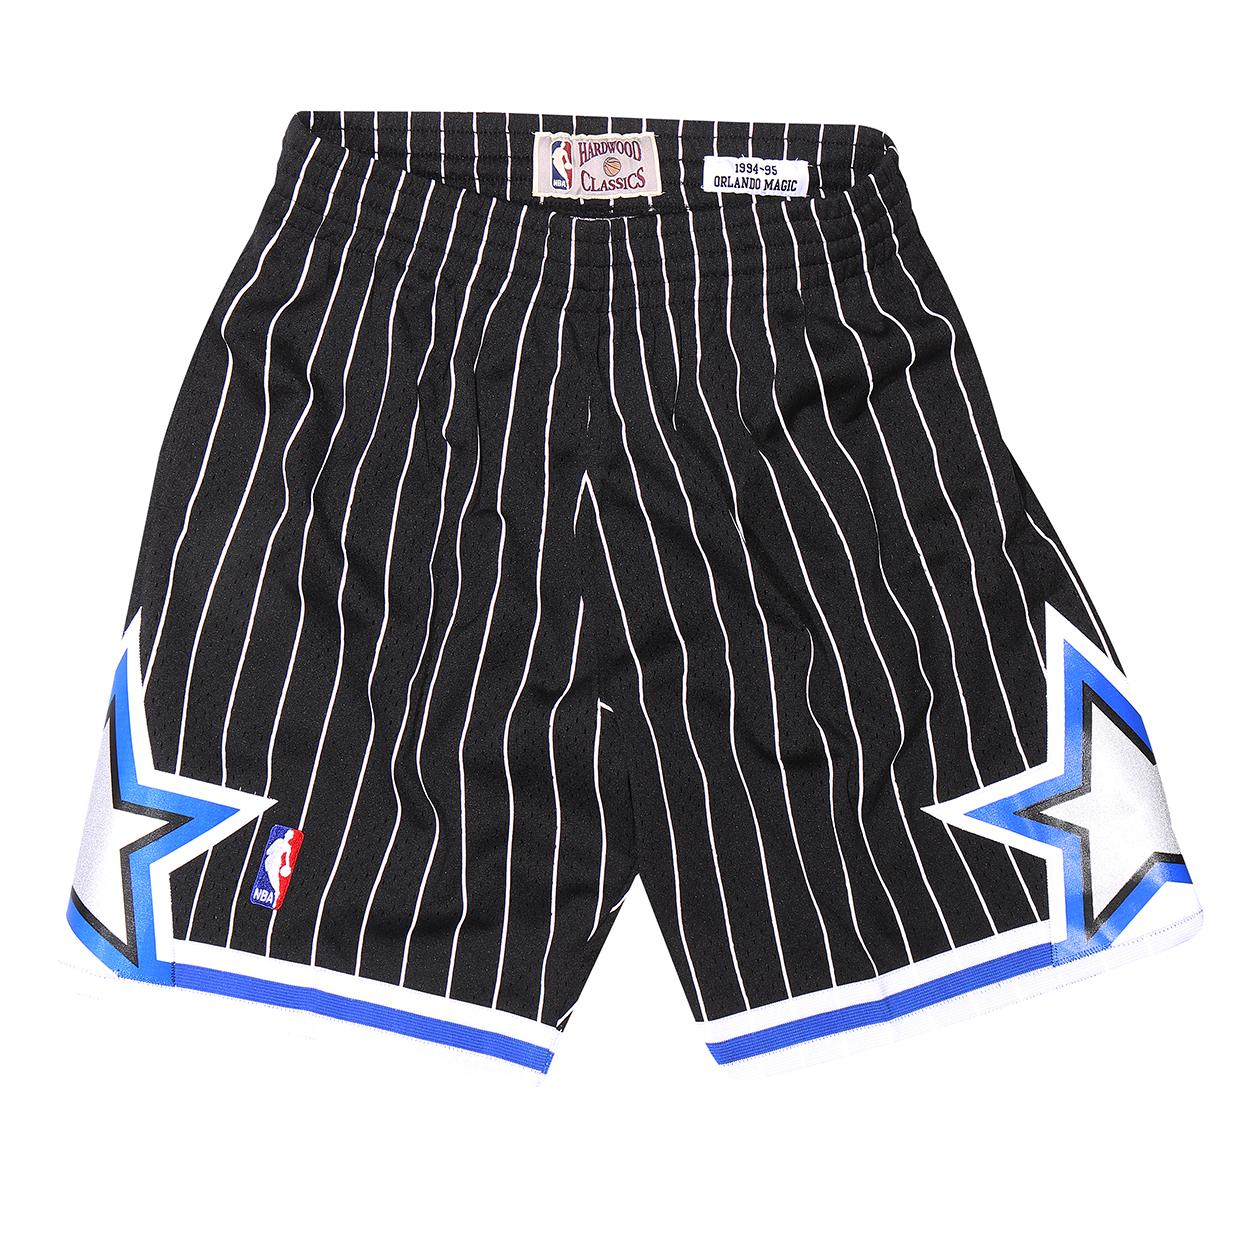 b82353785ec 1994-95 Alternate Swingman Shorts Orlando Magic